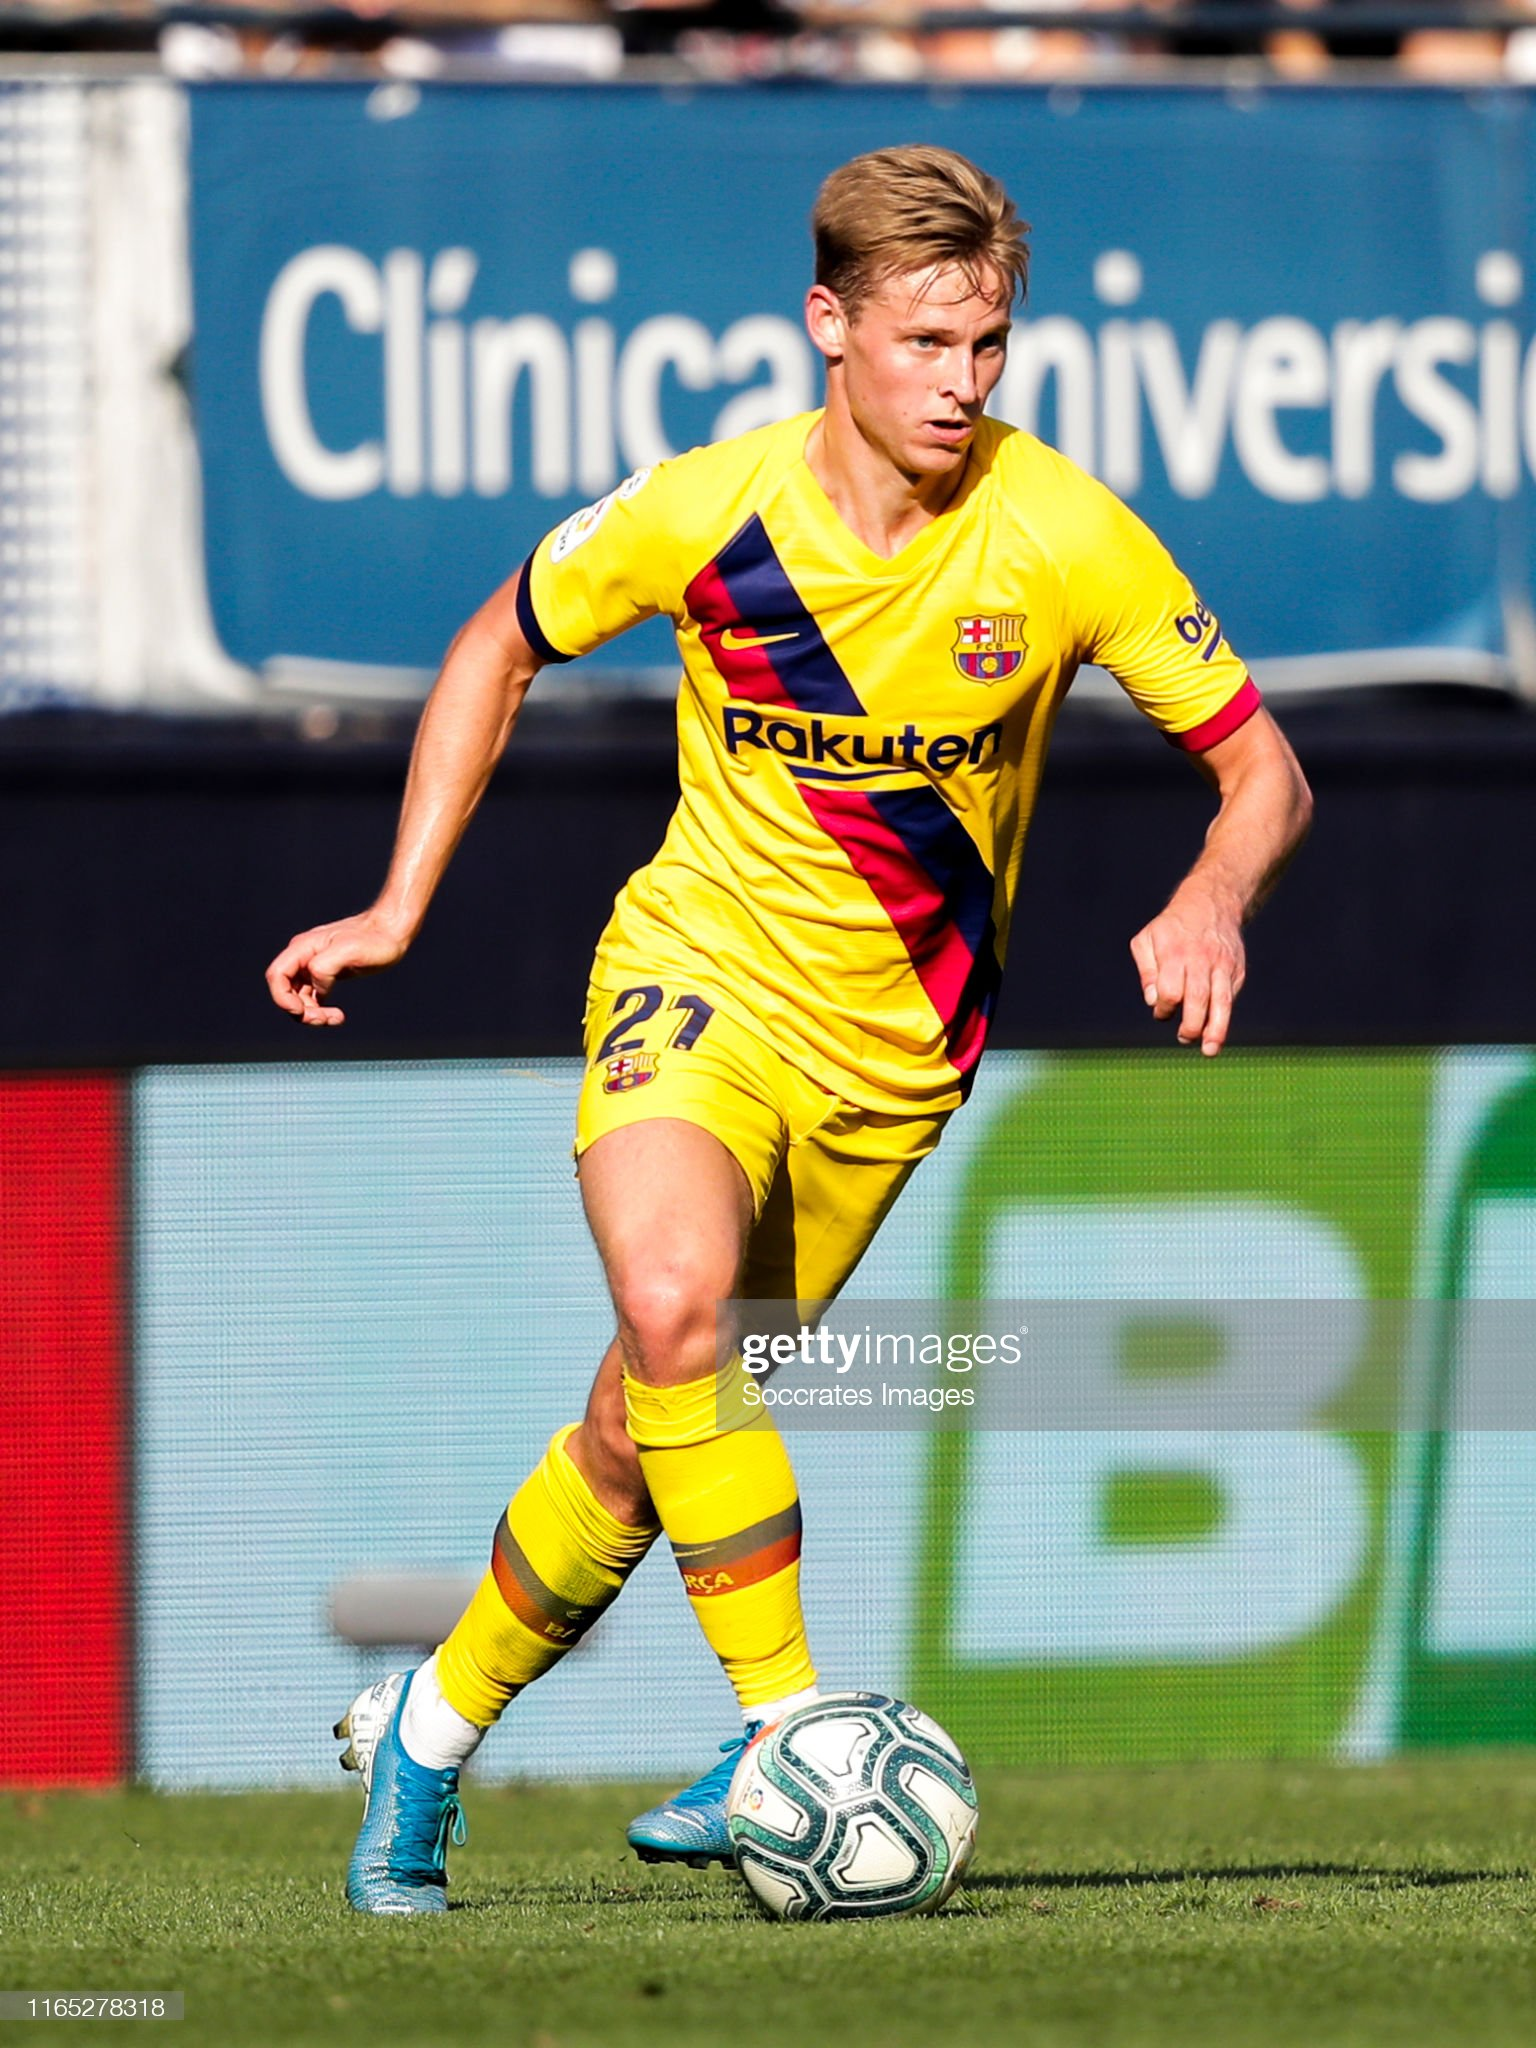 صور مباراة : أوساسونا - برشلونة 2-2 ( 31-08-2019 )  Frenkie-de-jong-of-fc-barcelona-during-the-la-liga-santander-match-picture-id1165278318?s=2048x2048